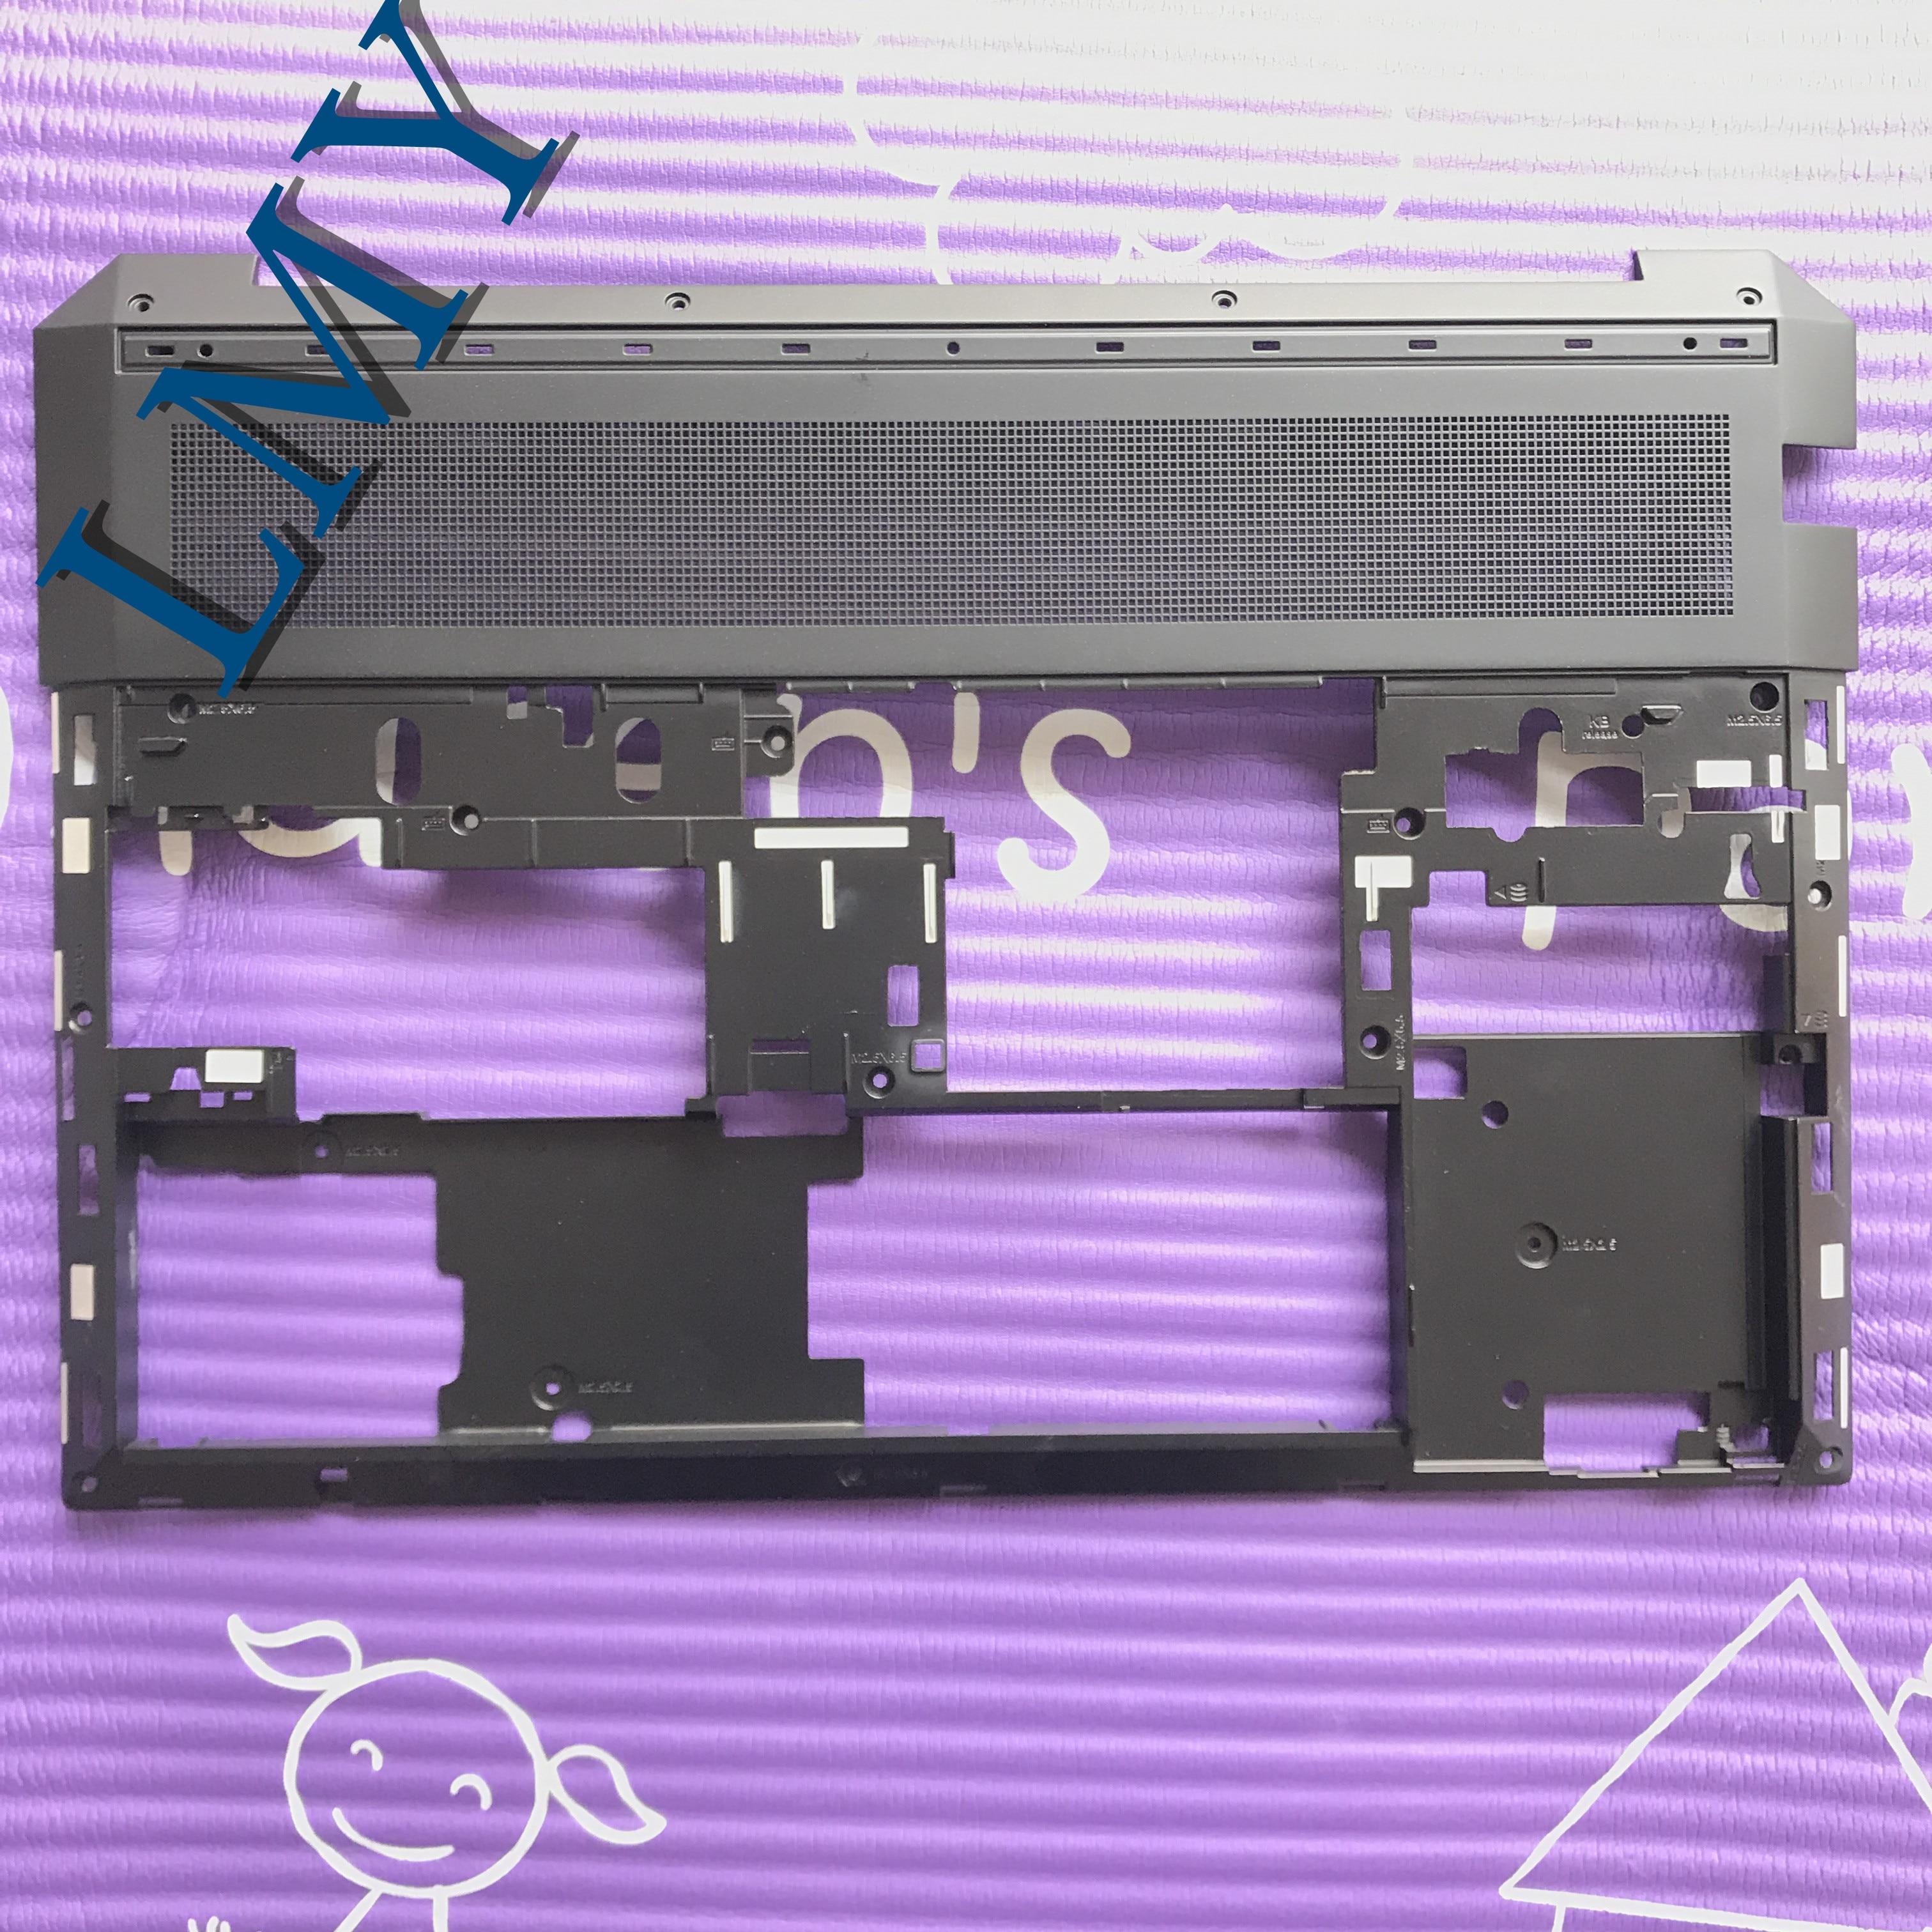 Brand New Replace Laptop Bottom Base Case for HP ZBOOK15 G5  Z15-G5 Bottom Base Main Board  D Shell Frame  GRAYBrand New Replace Laptop Bottom Base Case for HP ZBOOK15 G5  Z15-G5 Bottom Base Main Board  D Shell Frame  GRAY